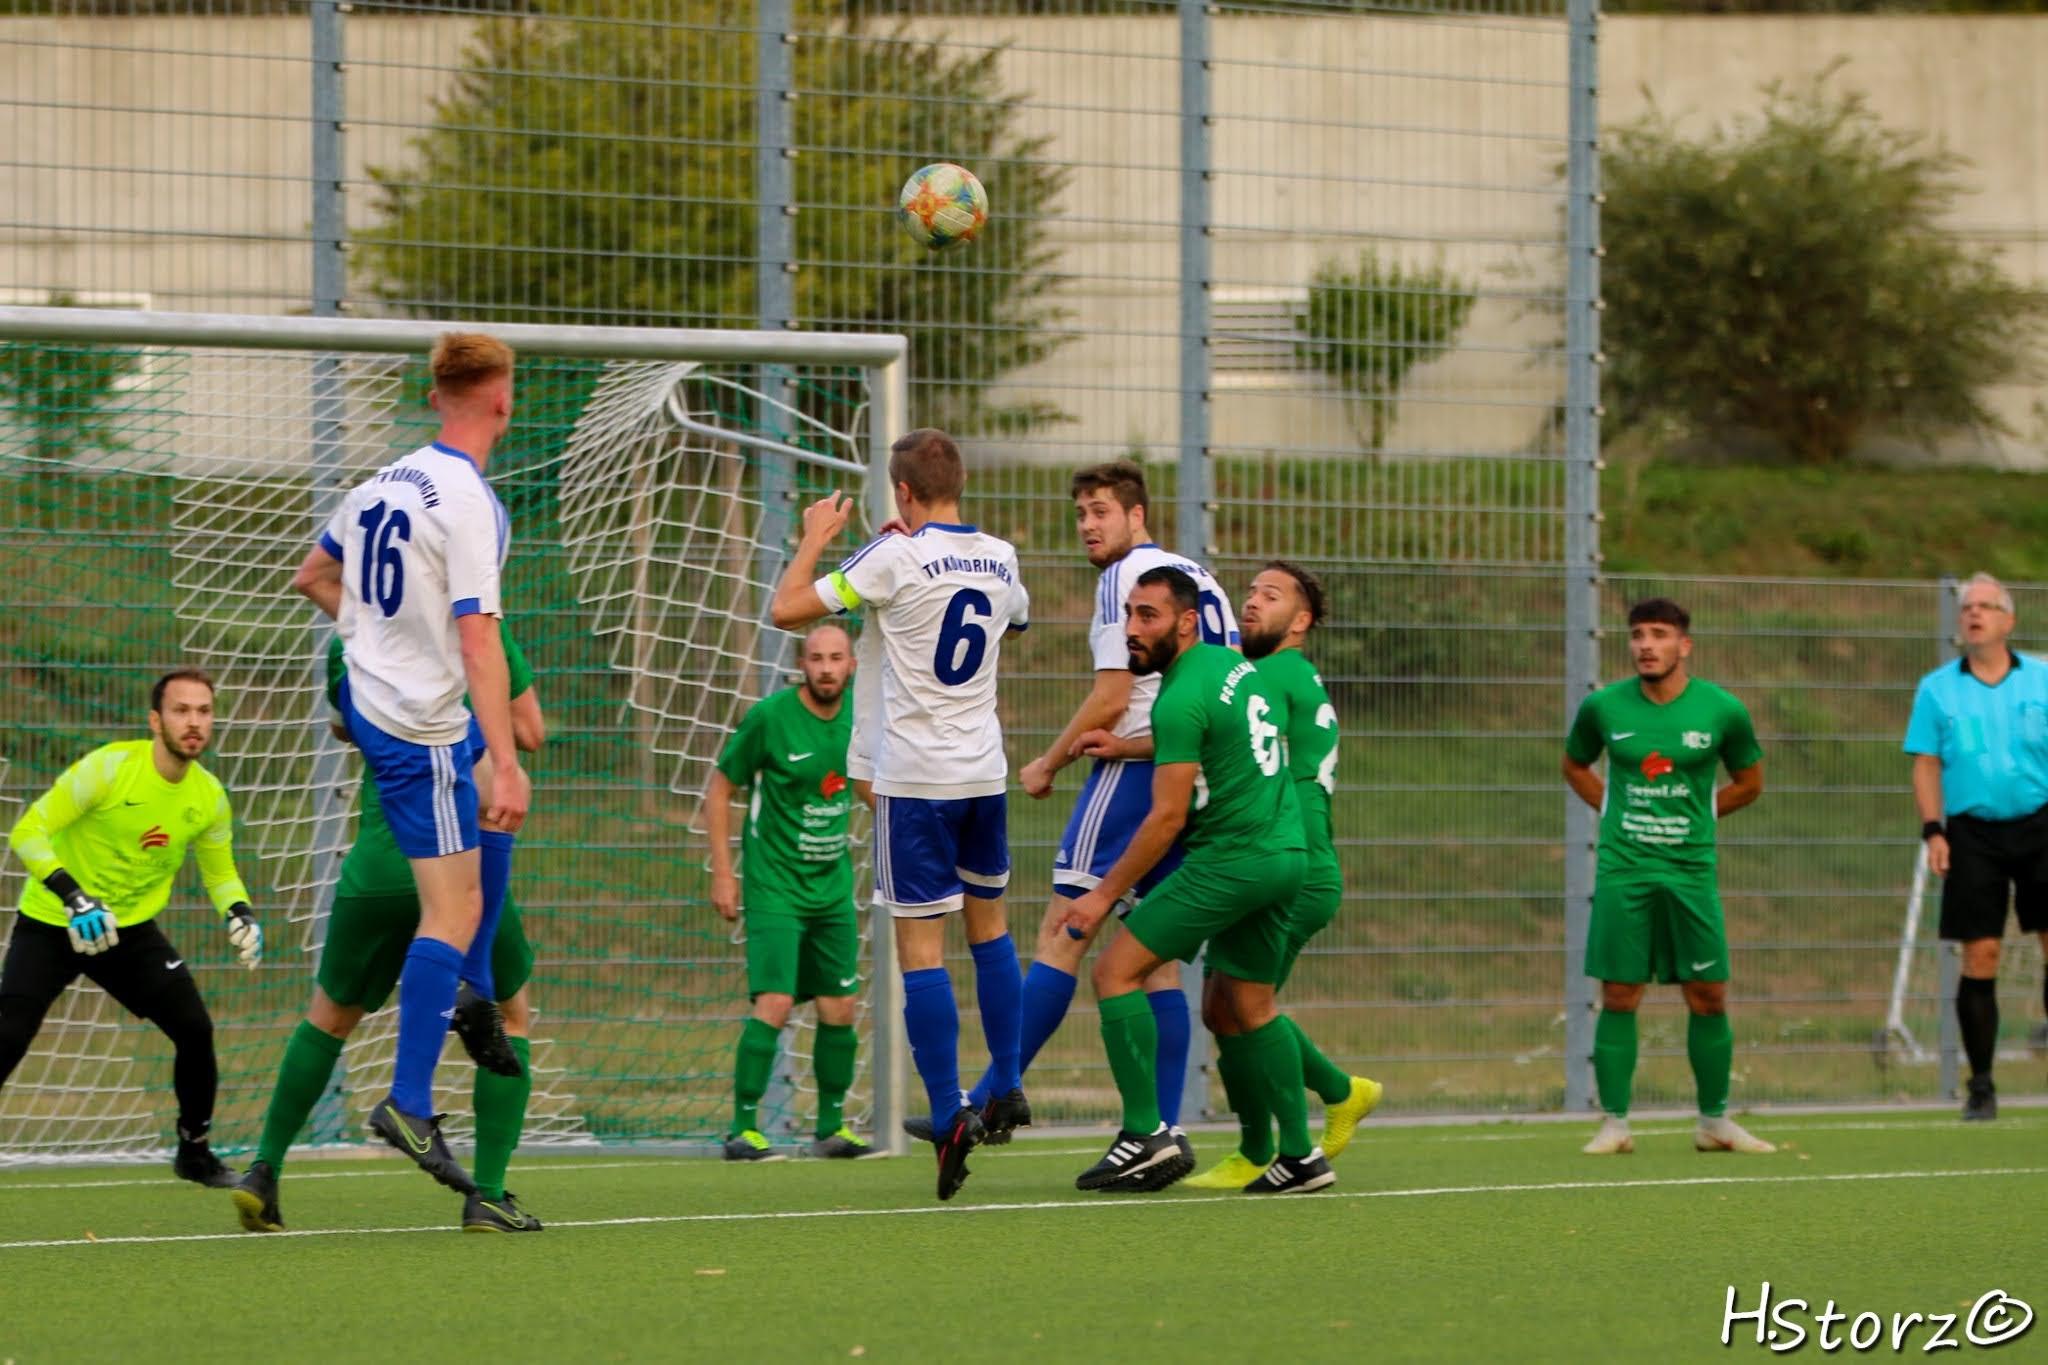 26.08.20 Bezirkspokal FC Kollnau – TVK I  2:3 (0:1)